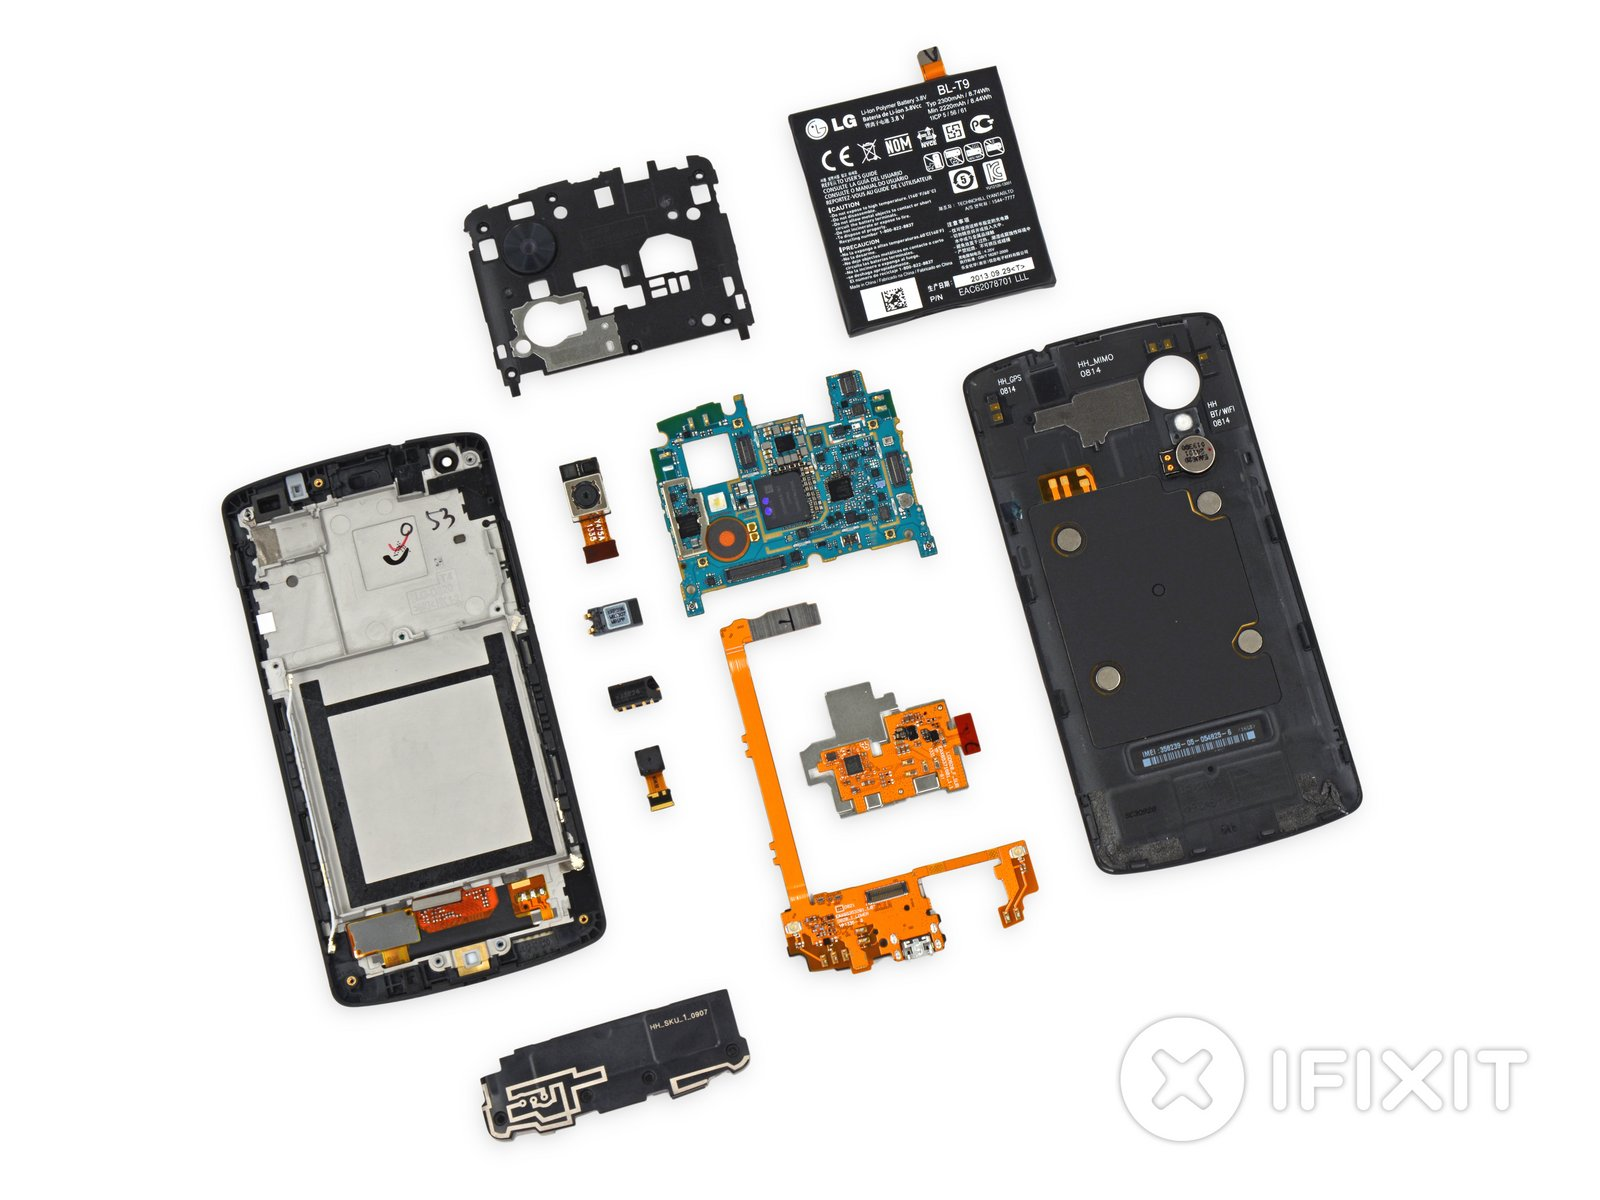 Nexus 5 teardown ifixit ccuart Gallery